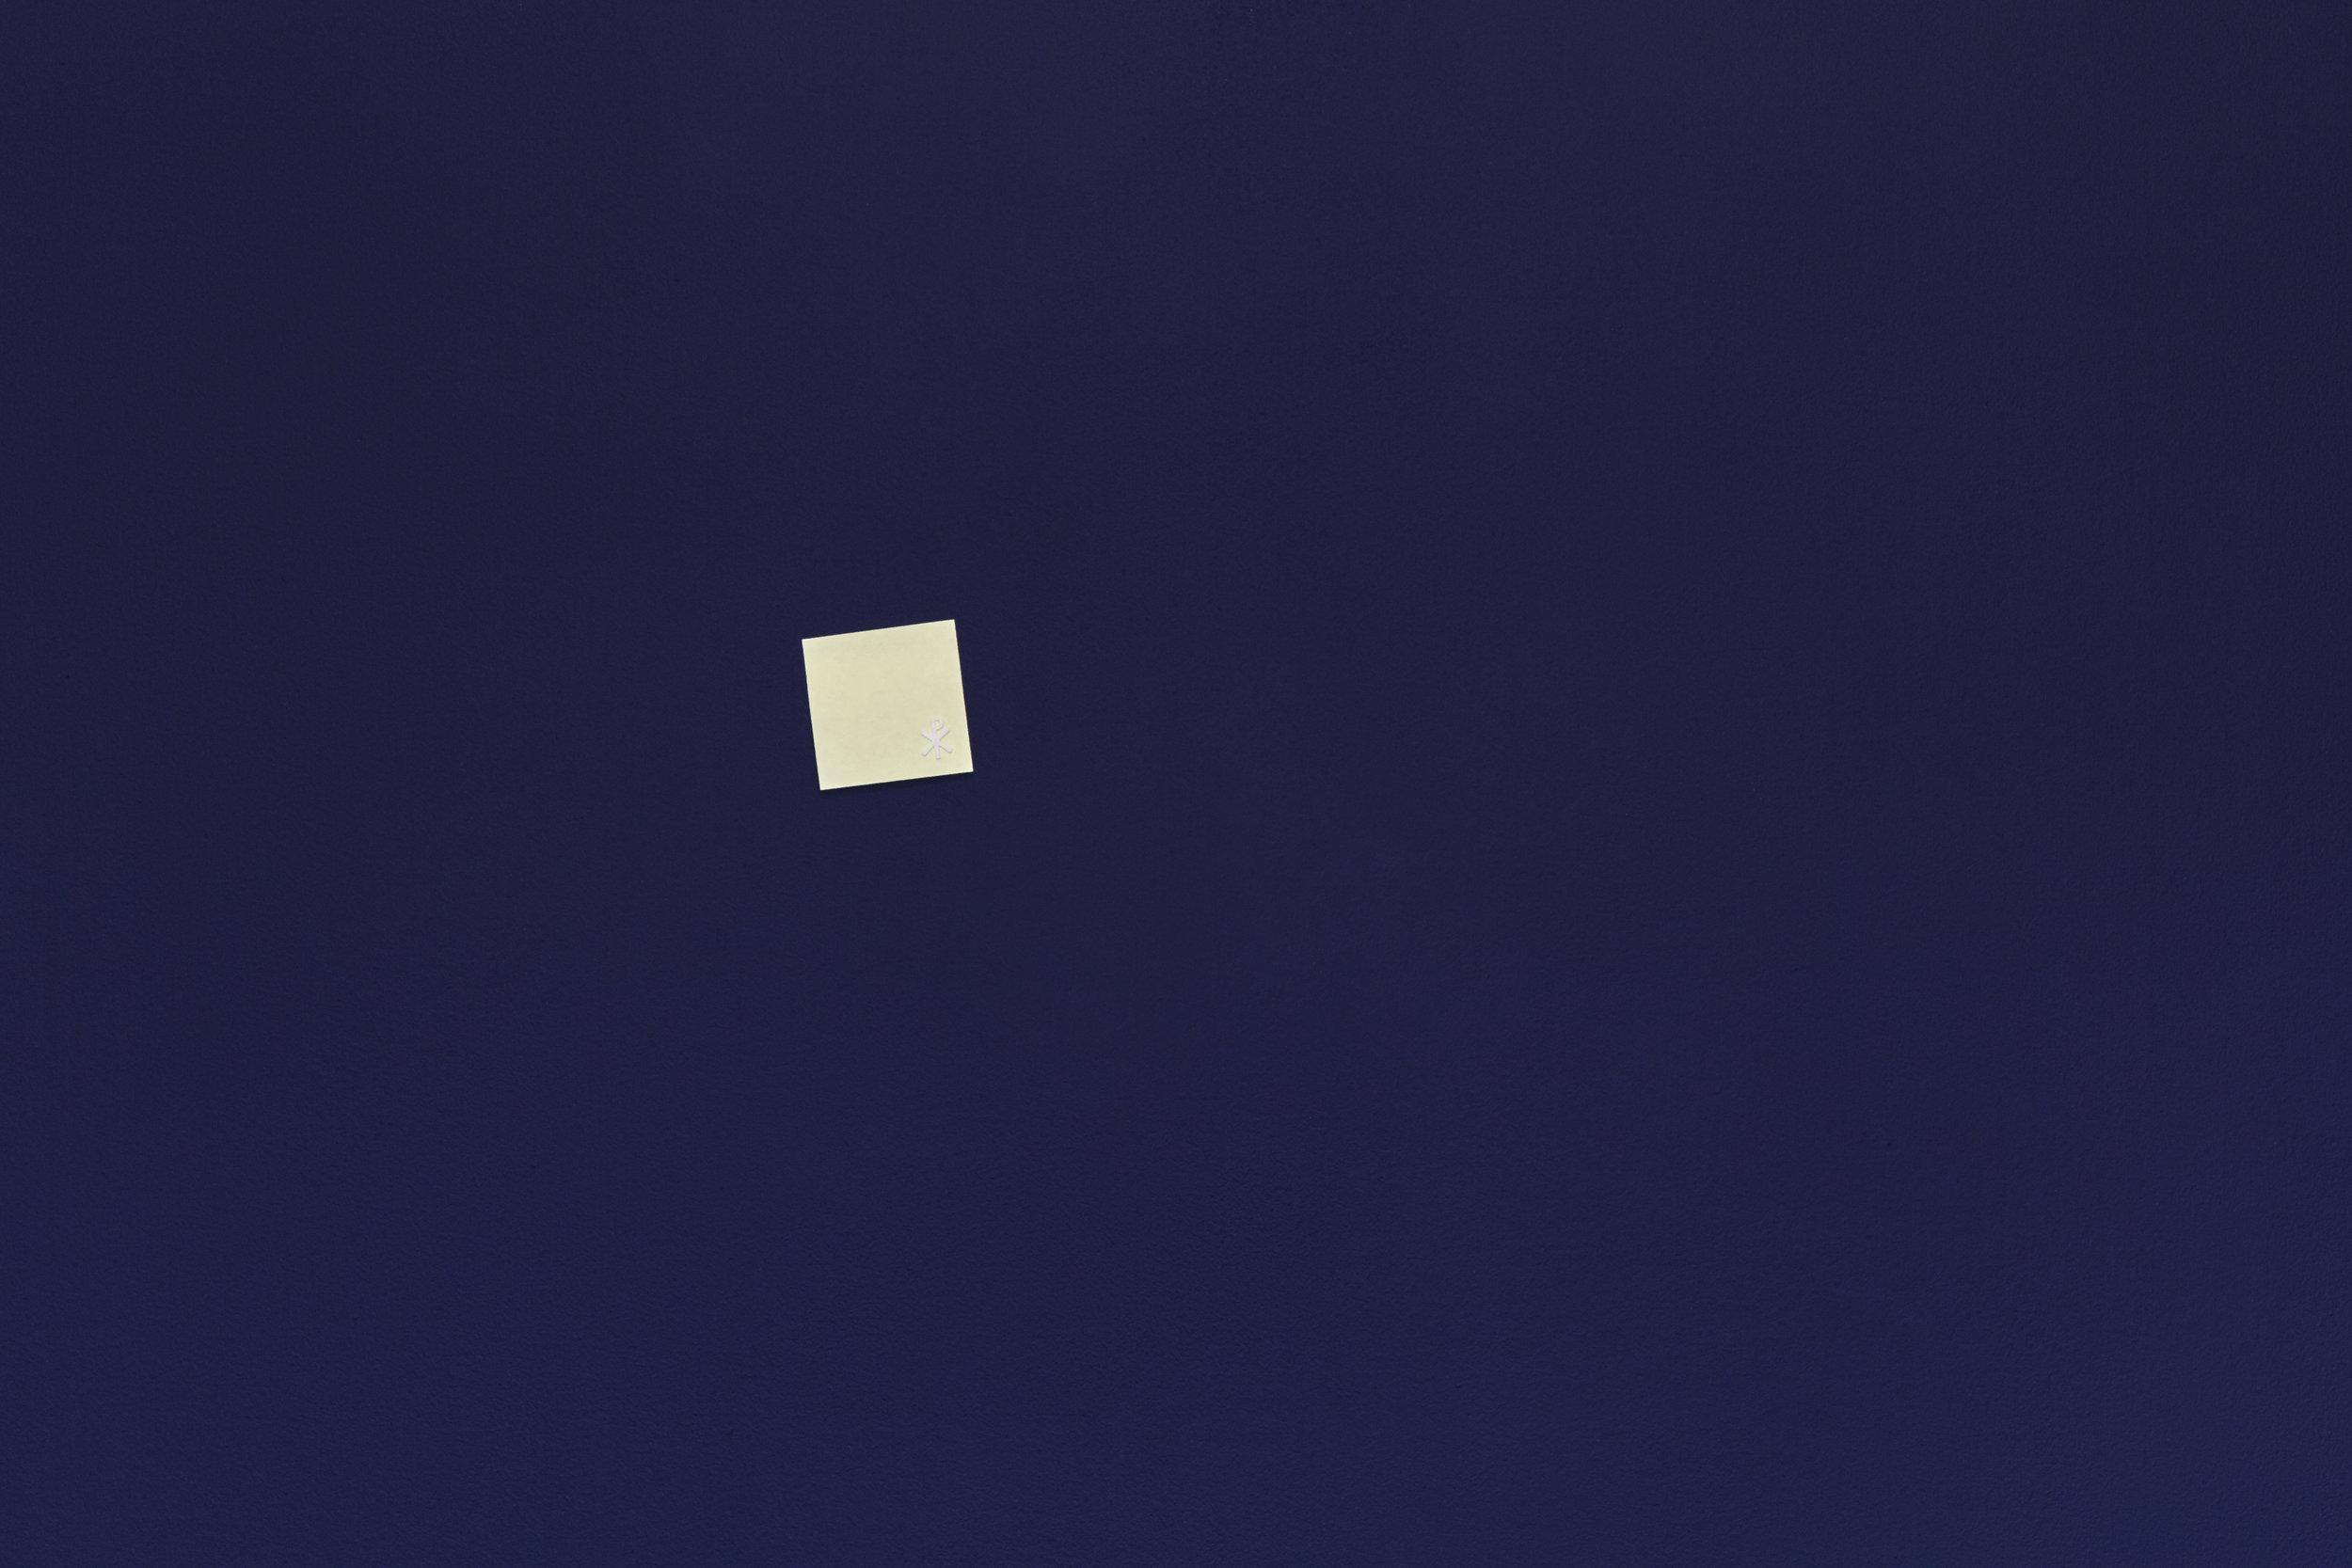 Pure Accident , 2019 3M Post-it® Note, 3D printed PLA (Chi Ro symbol) 7.5 x 7.5 cm